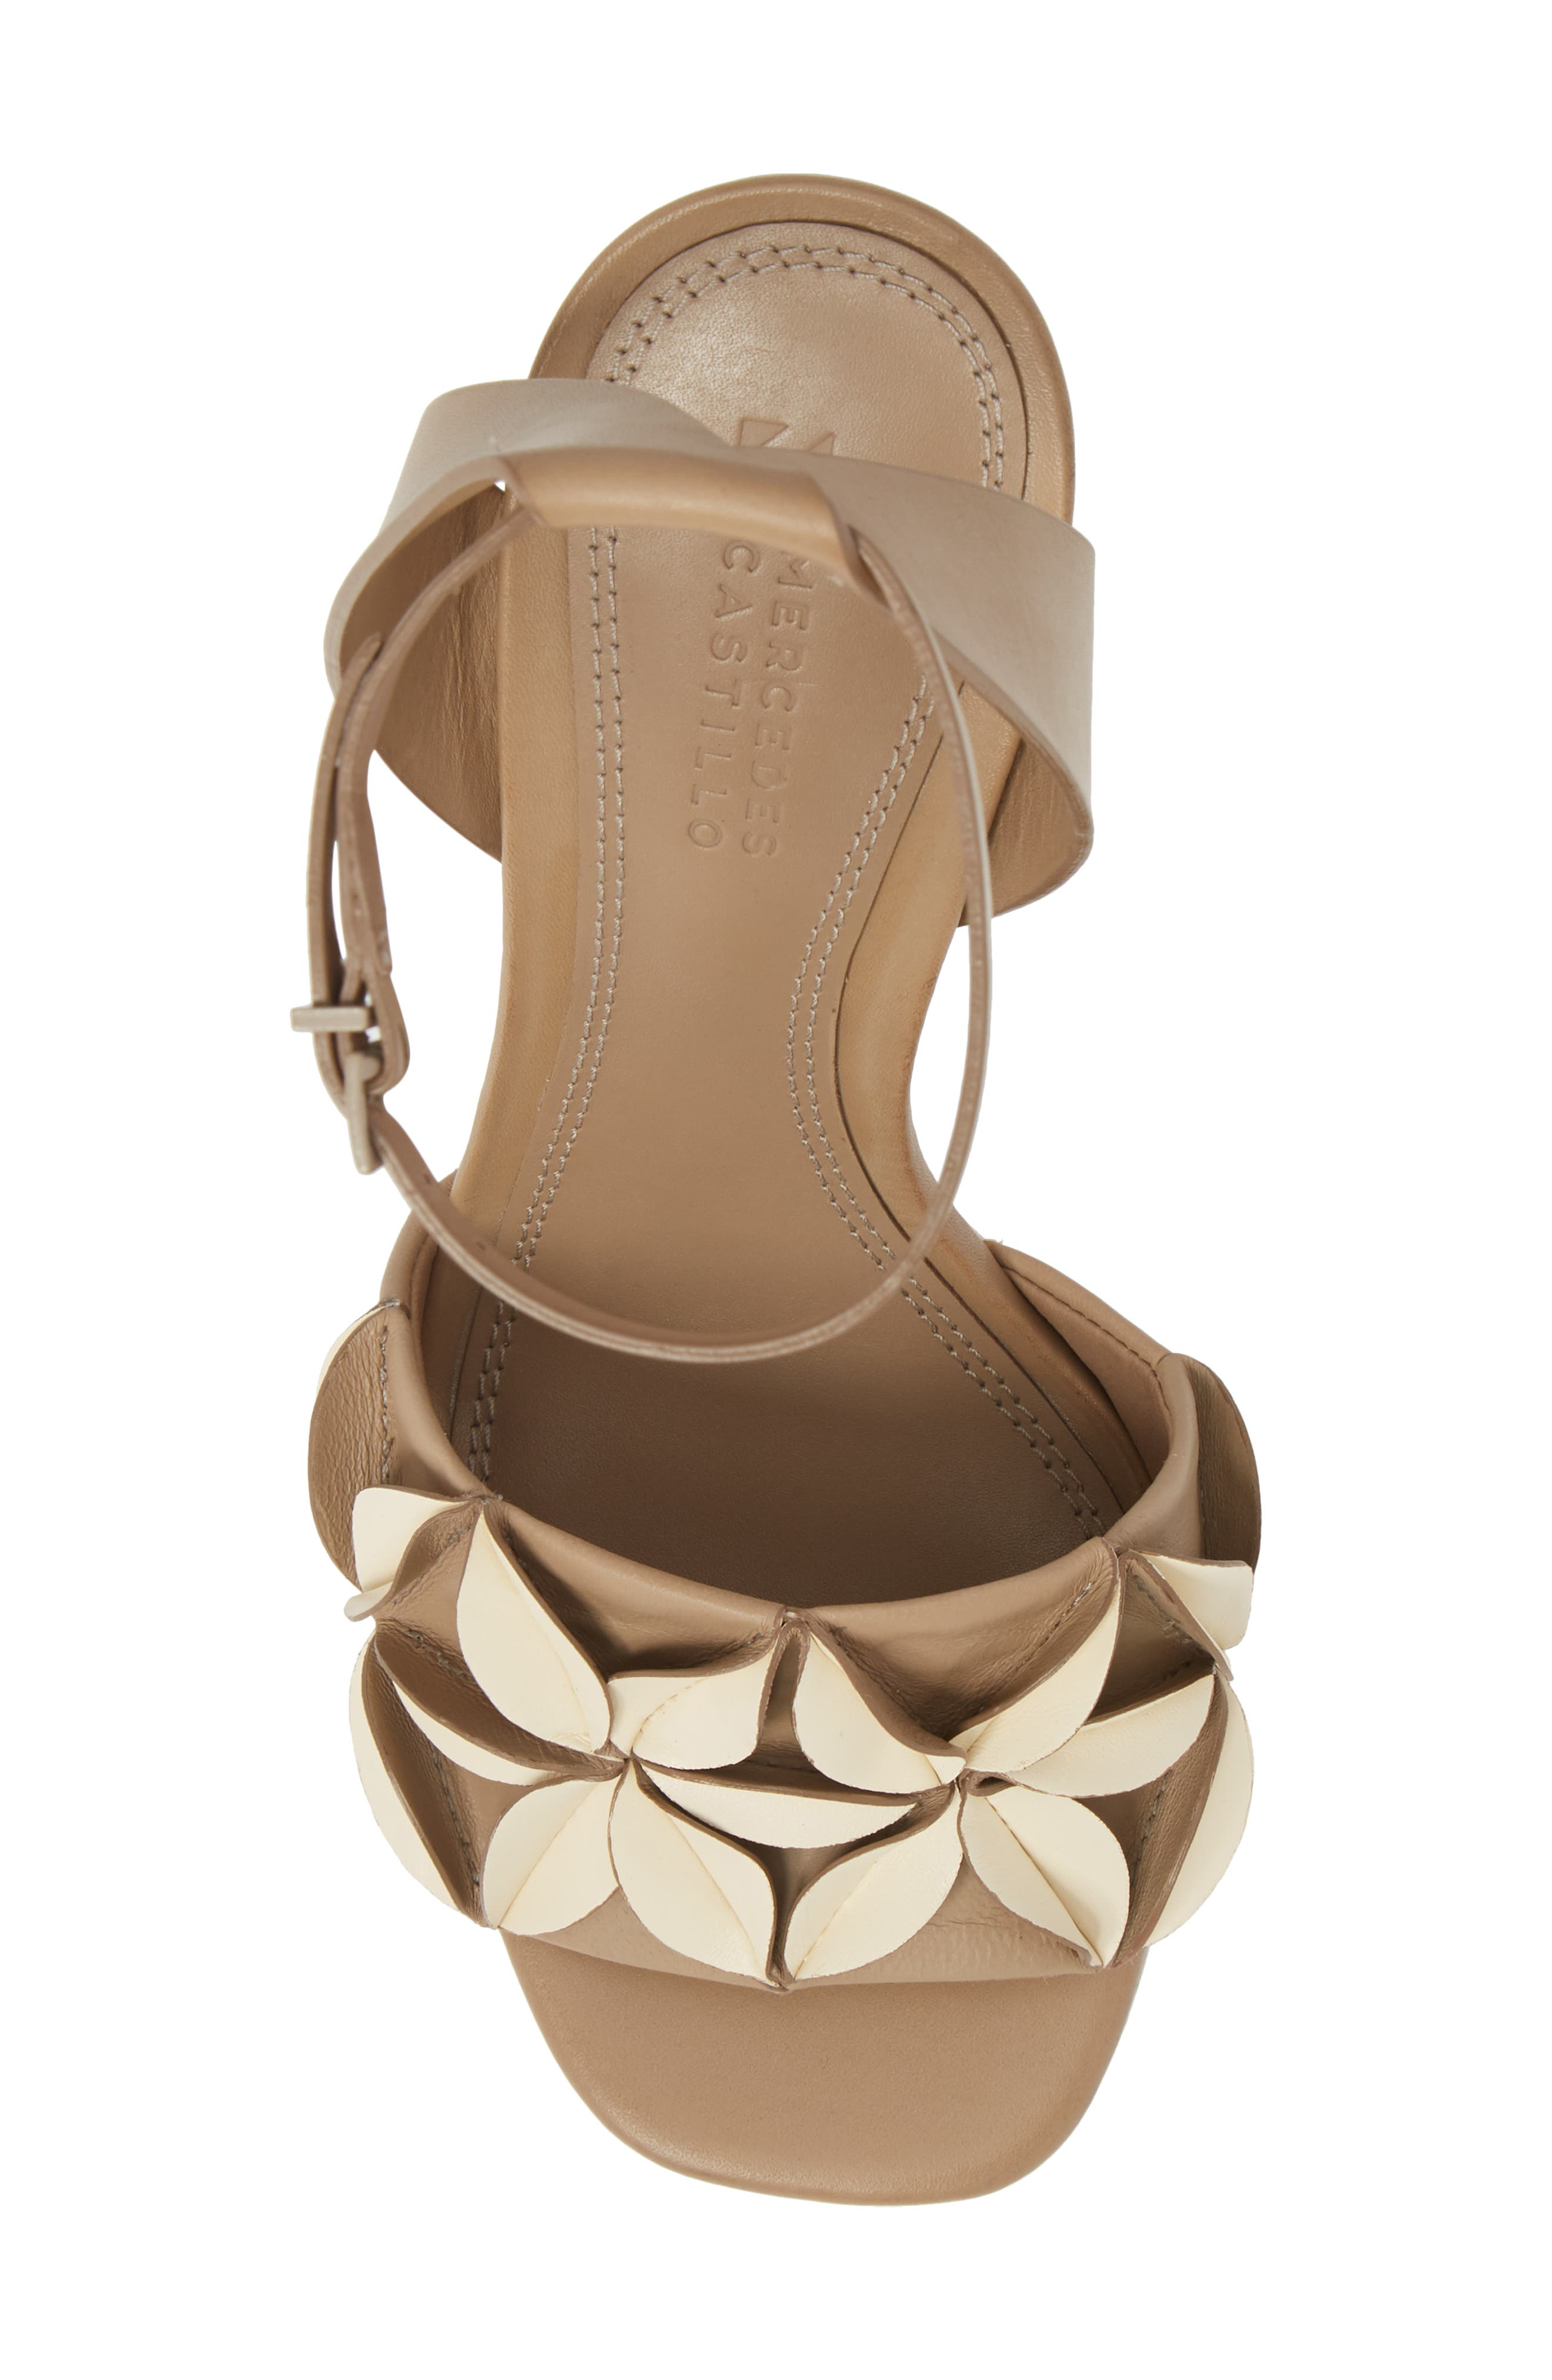 Milee Ankle Strap Sandal,                             Alternate thumbnail 5, color,                             250